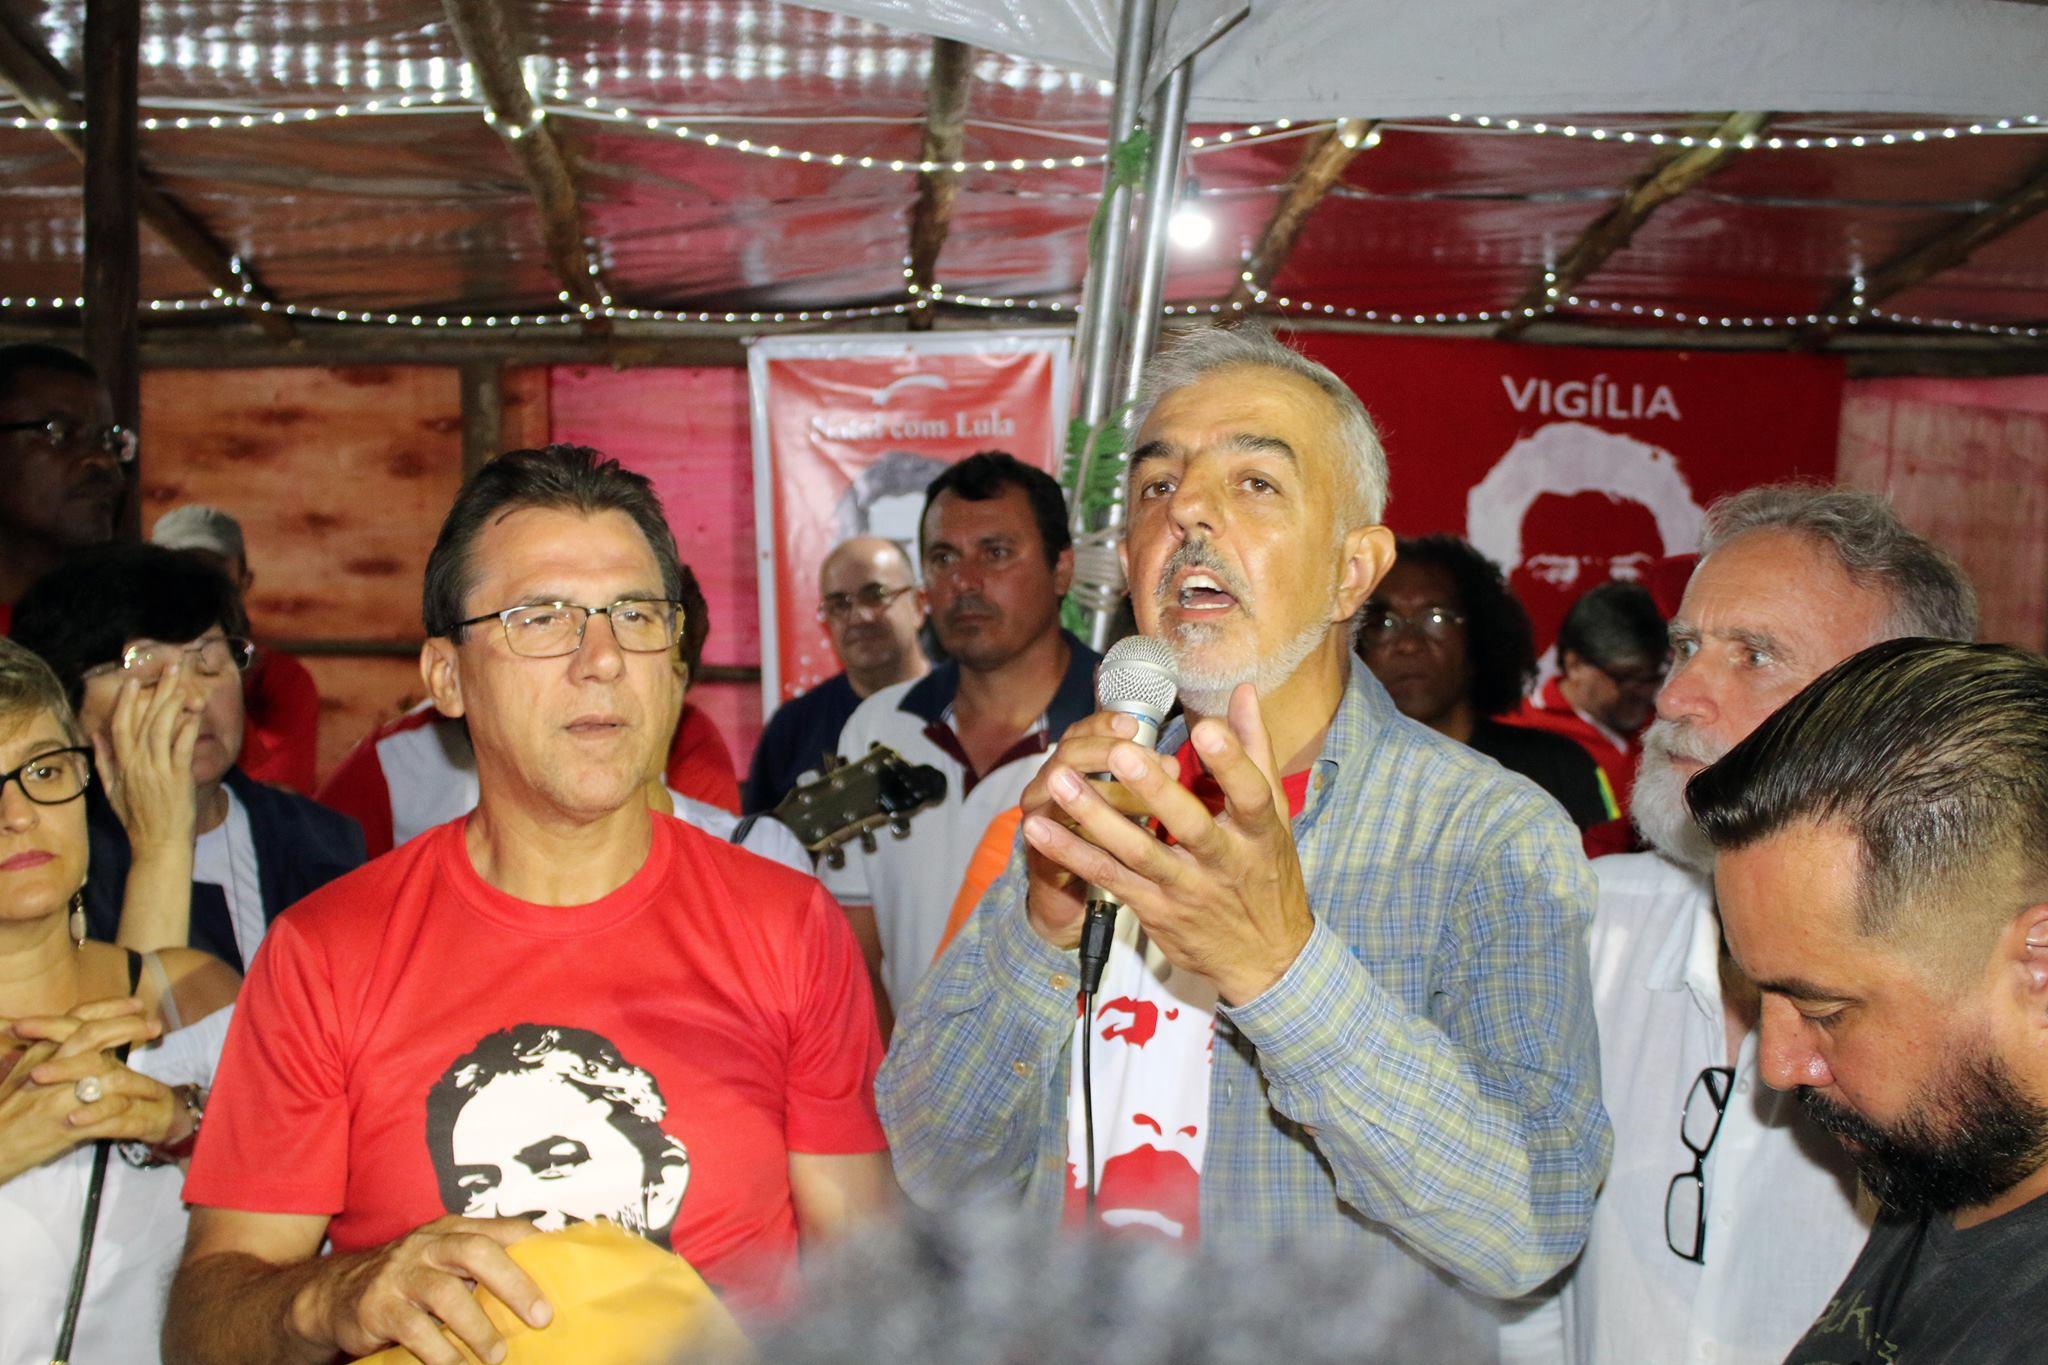 FOTO33-Jornalistas Livres